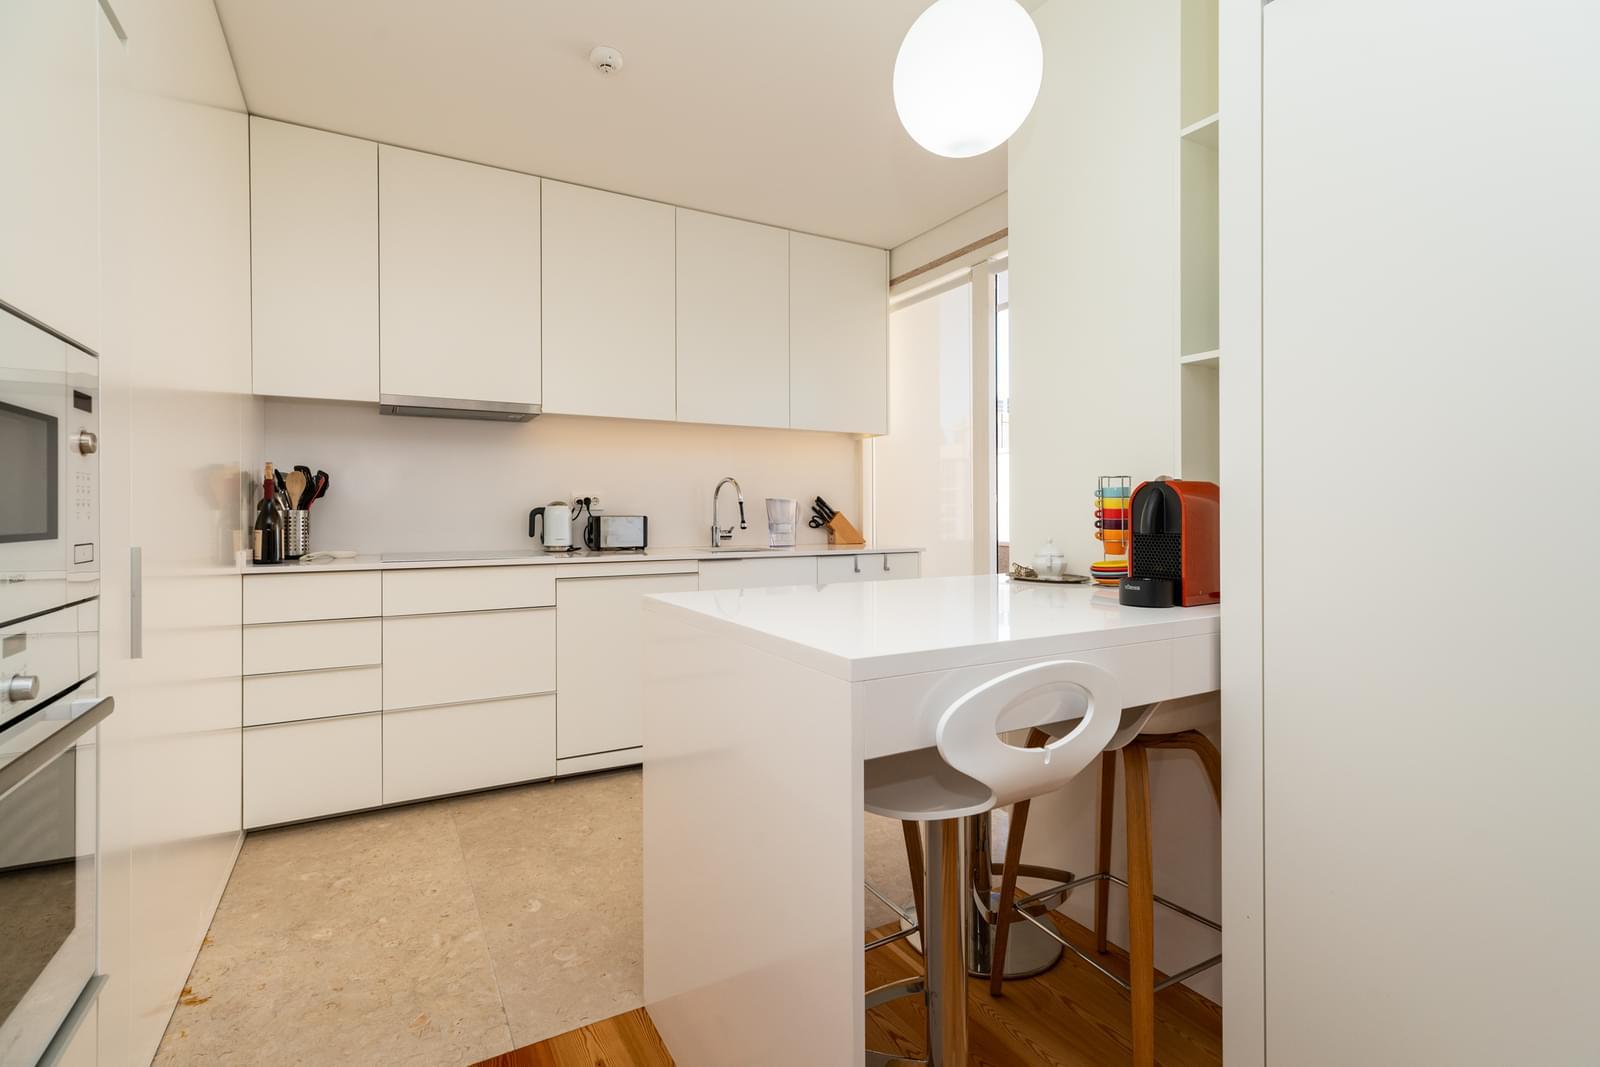 pf19126-apartamento-t2-lisboa-c8bb0cf9-21ab-4a4f-ad6c-274865bb860a